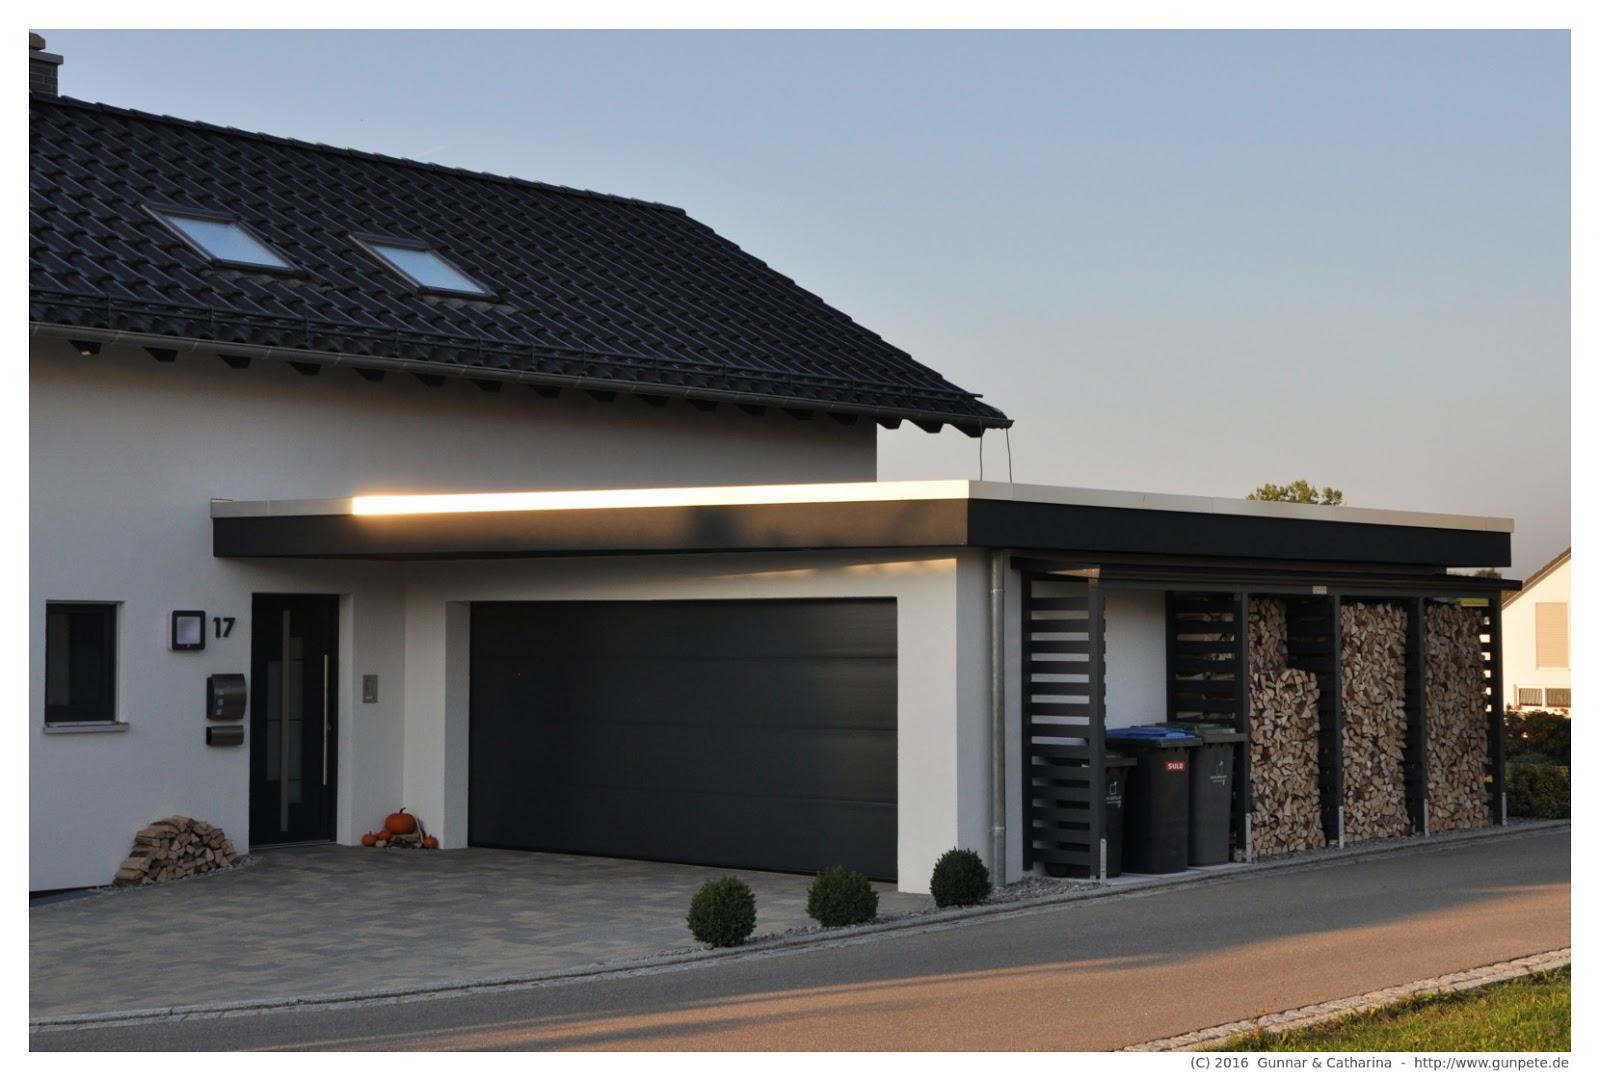 gunnar catharina wir bauen unser fingerhaus. Black Bedroom Furniture Sets. Home Design Ideas